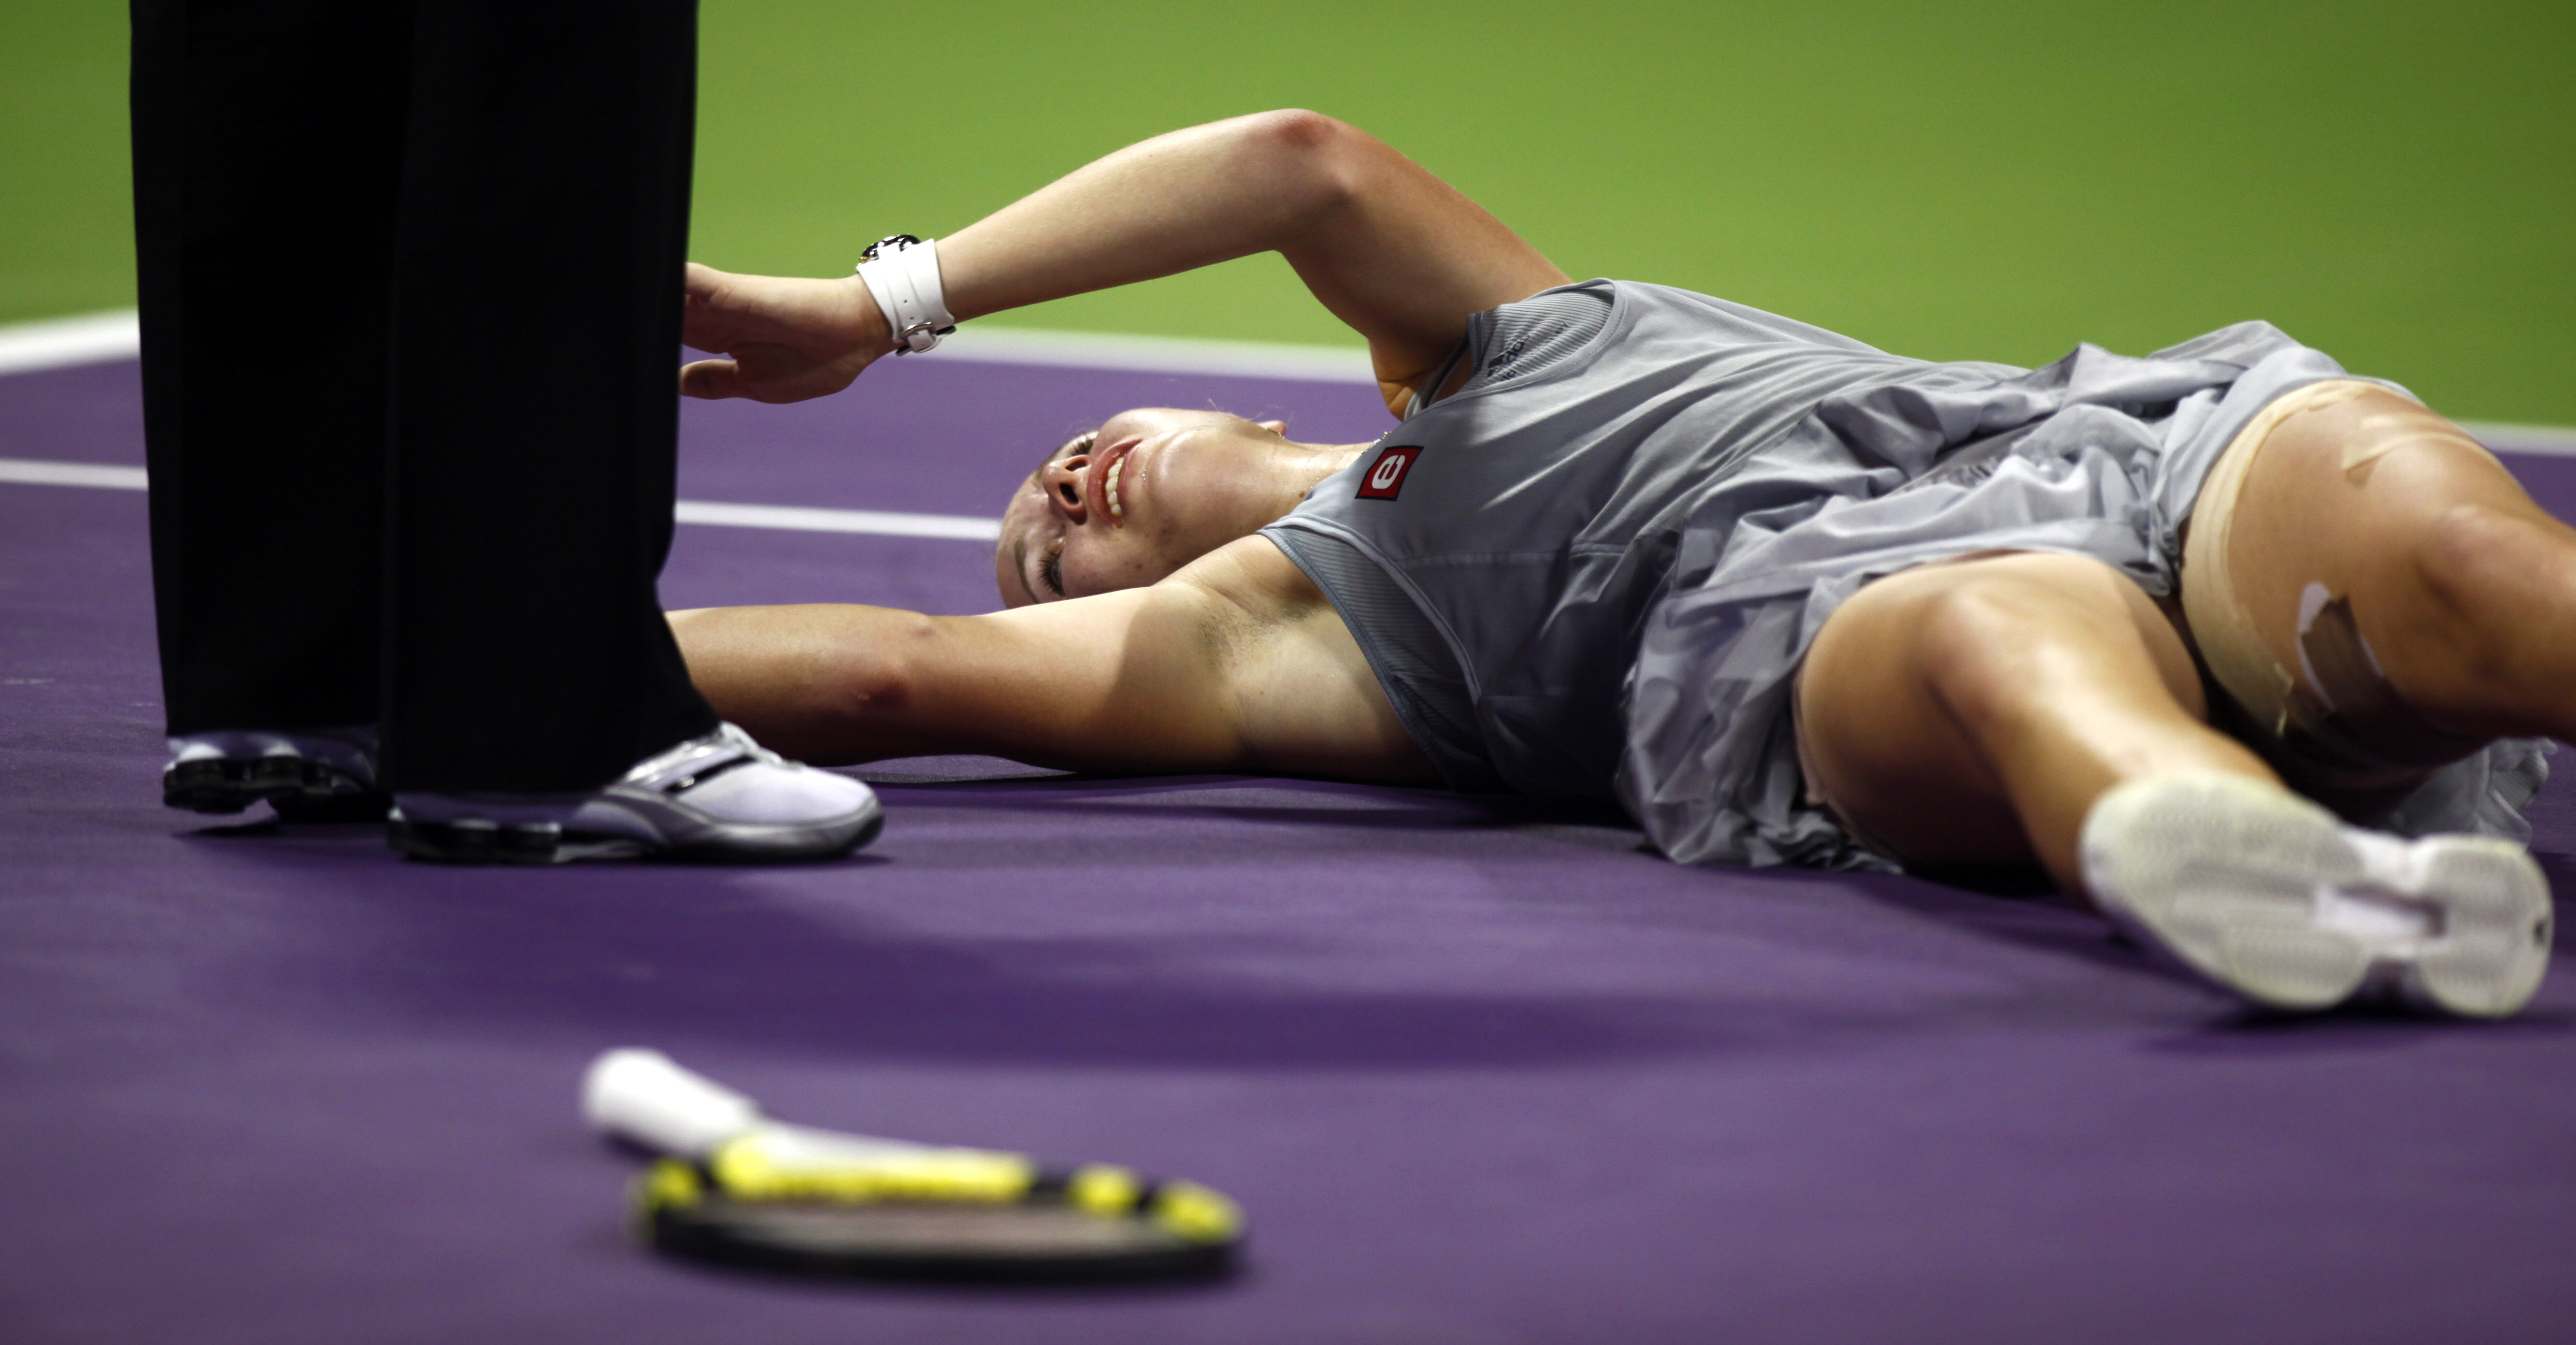 Caroline Wozniacki came down with leg cramps.